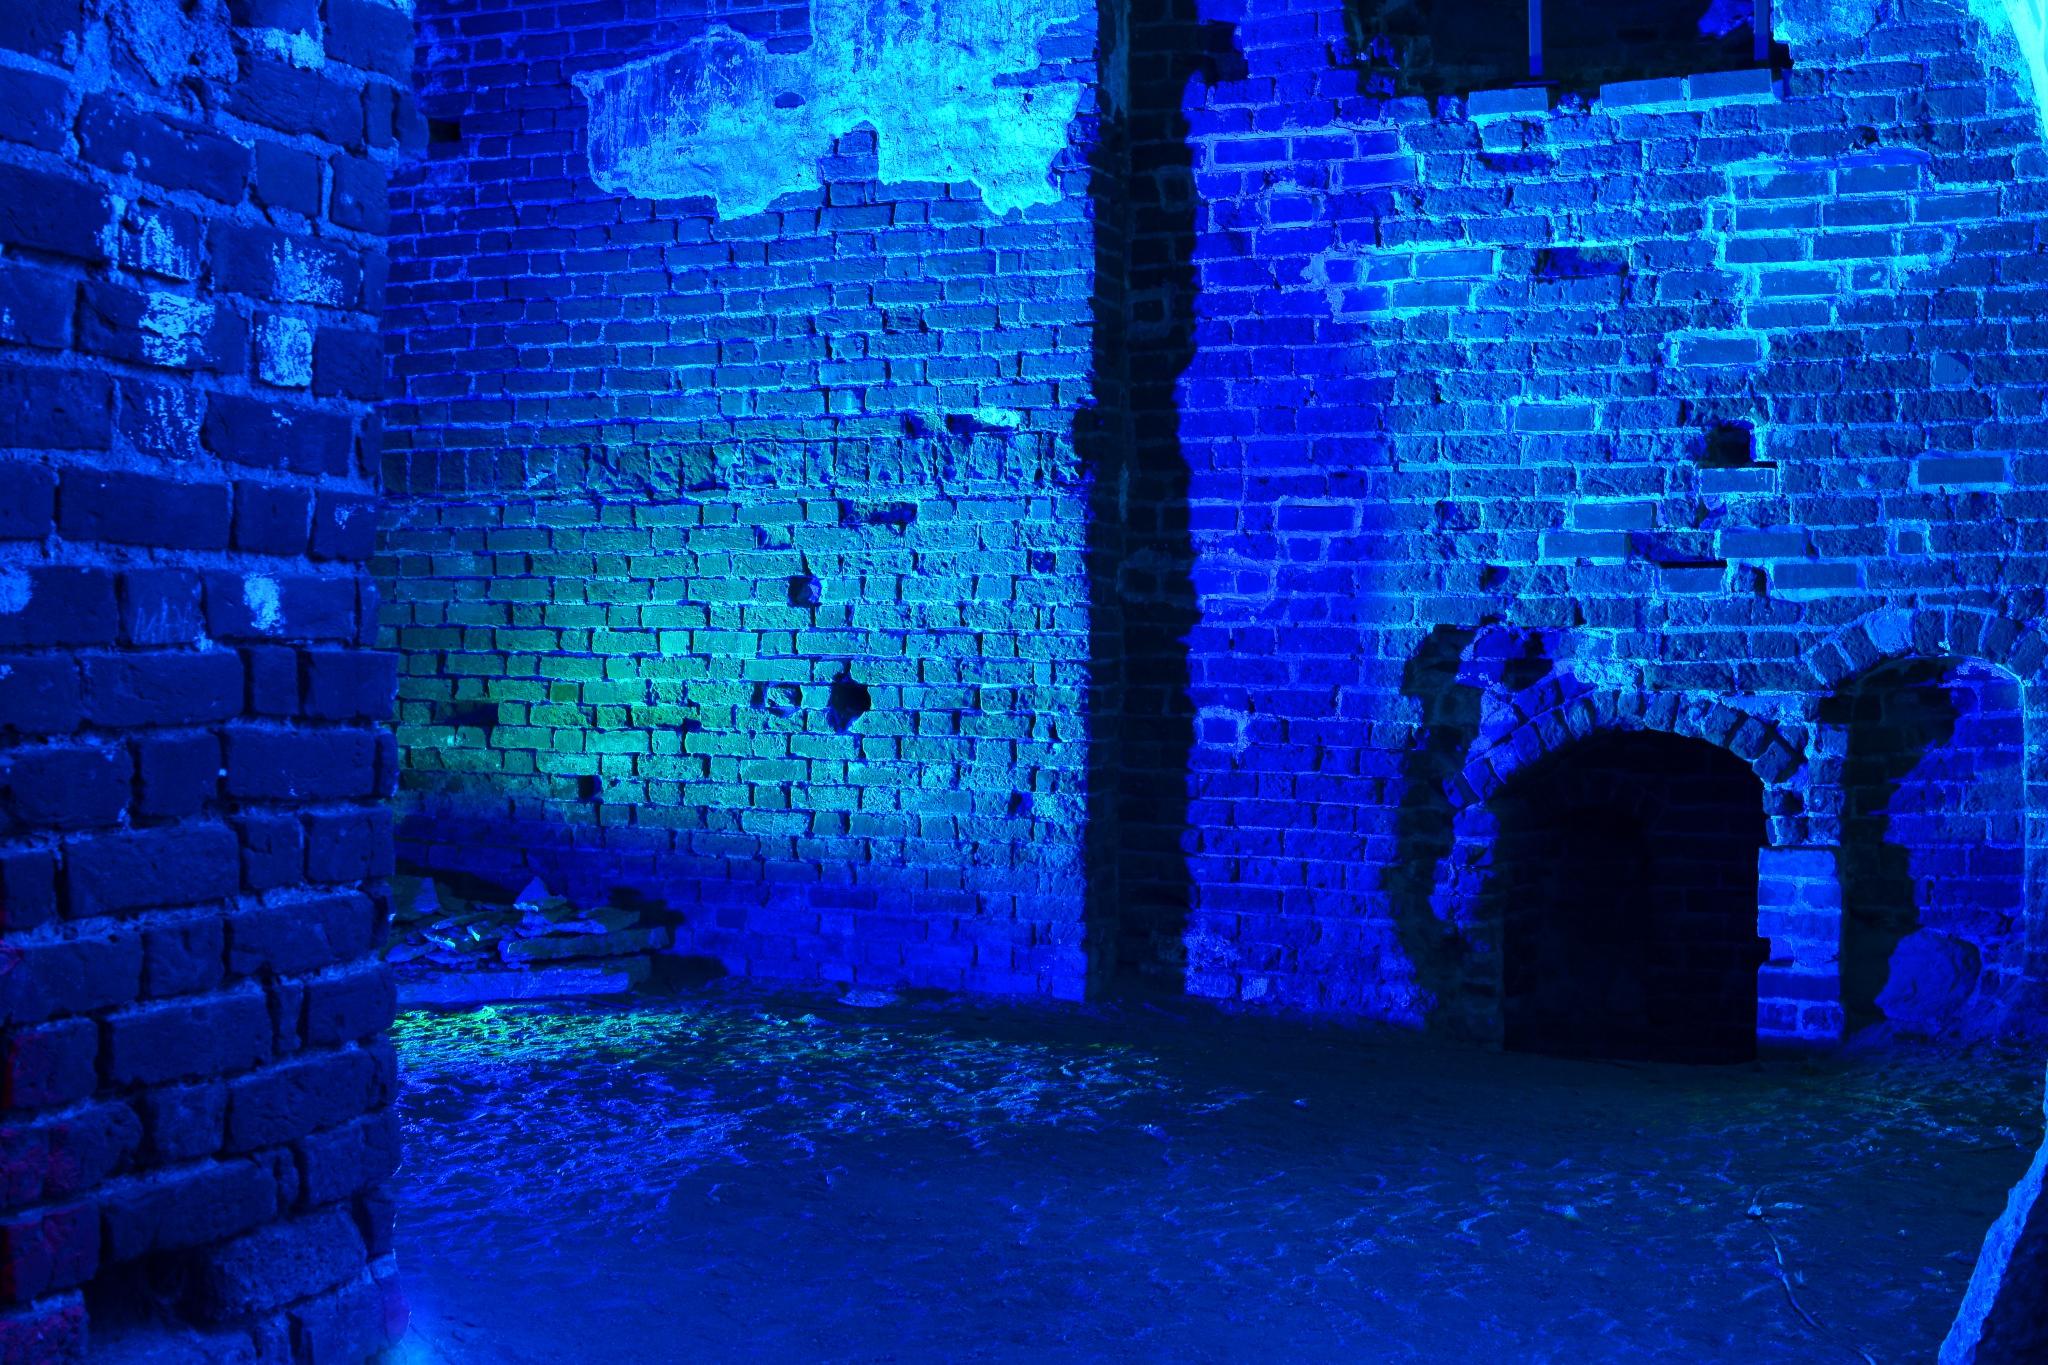 lighting lights wallpaper blue